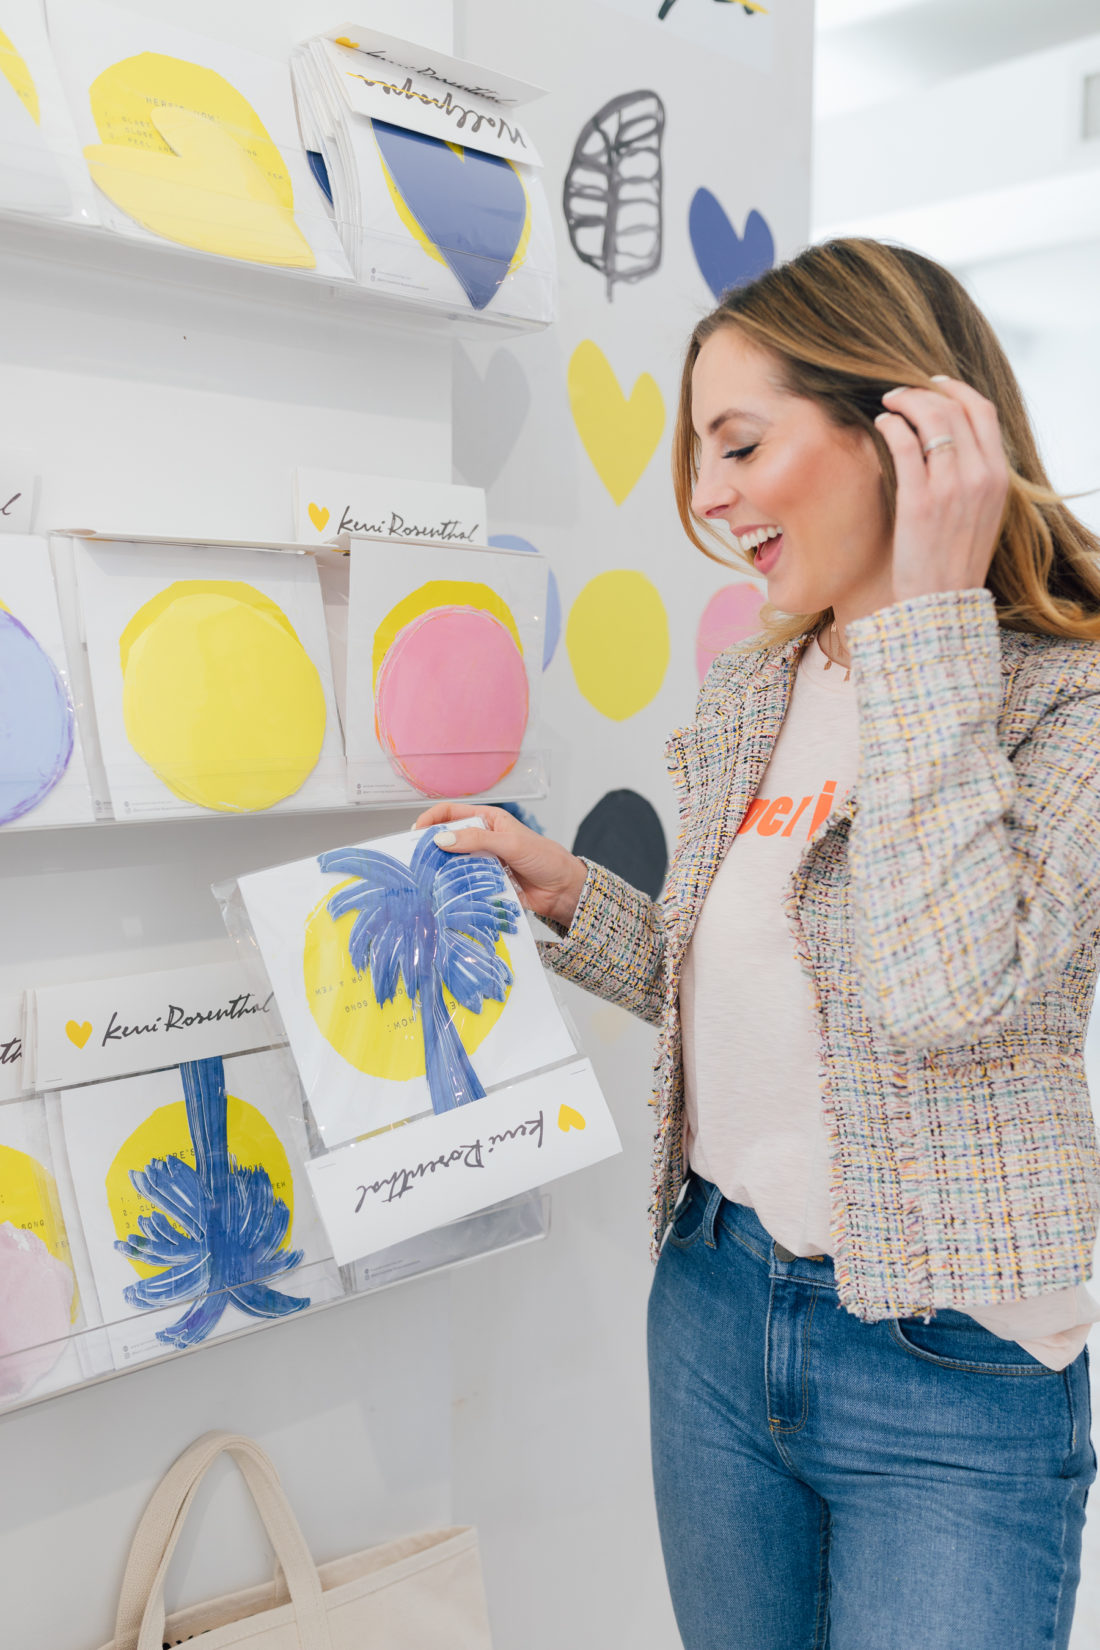 Kerri Rosenthal talks design with Eva Amurri Martino of Happily Eva After at her shop in Westport, CT